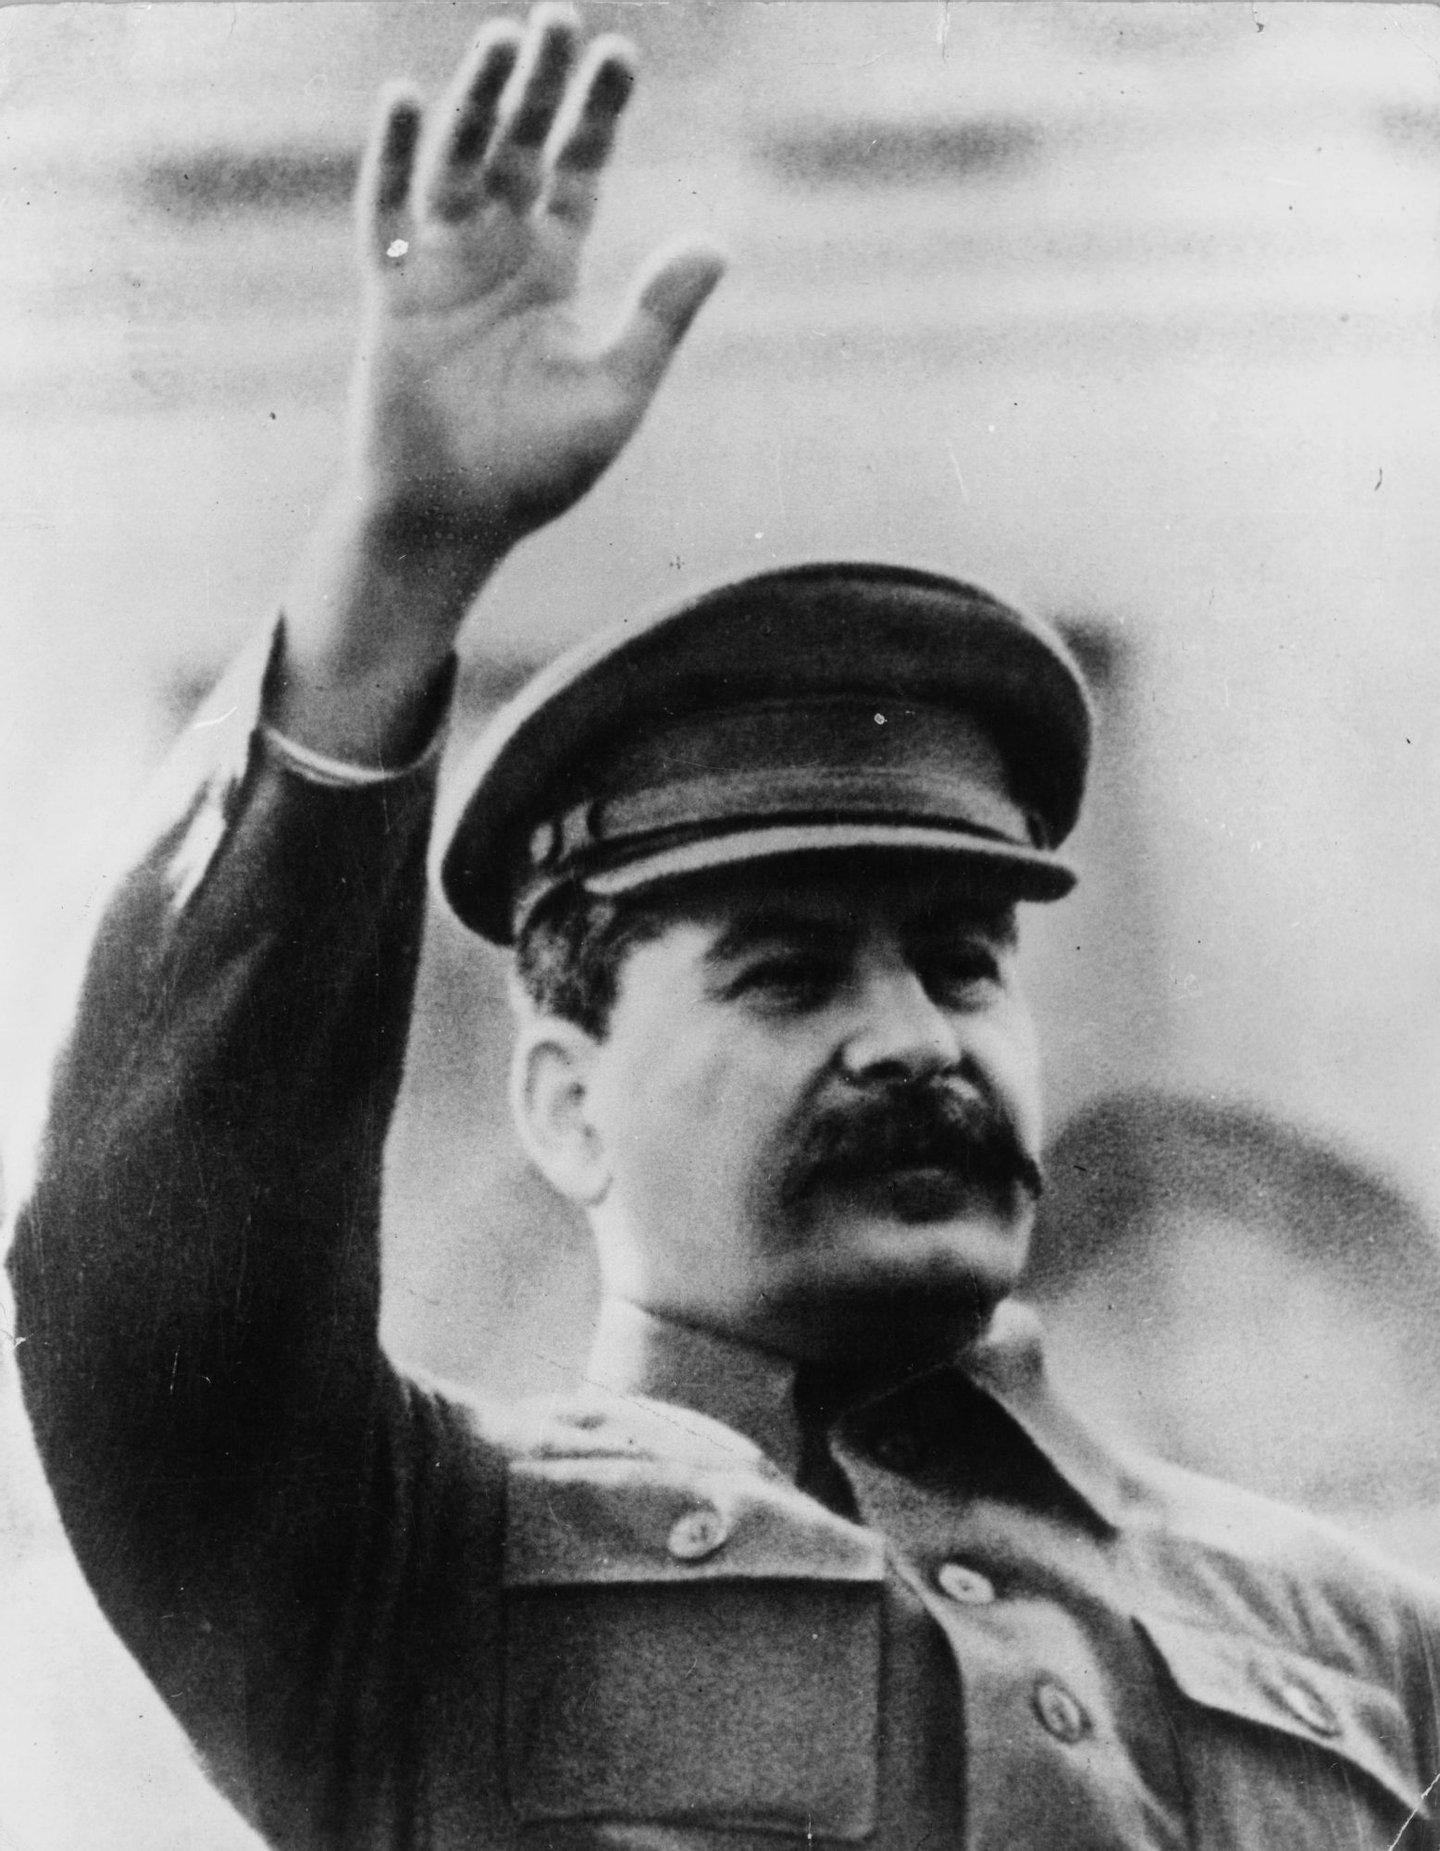 1949: Soviet statesman and Premier Joseph Stalin (1879 - 1953). (Photo by Keystone/Getty Images)